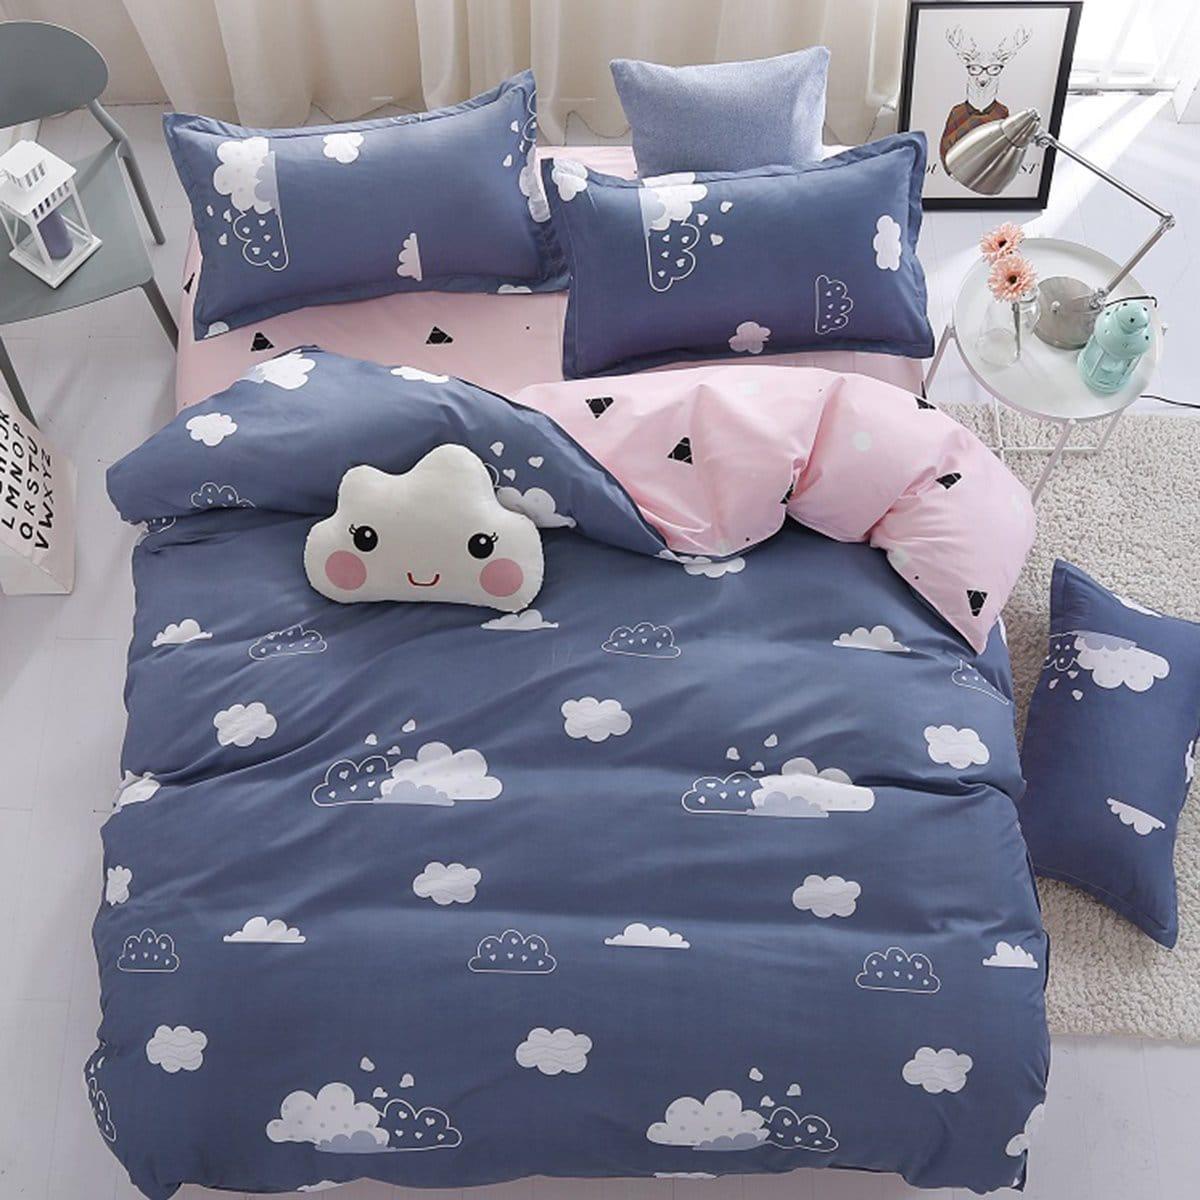 Cloud Print Bed Sheet Set